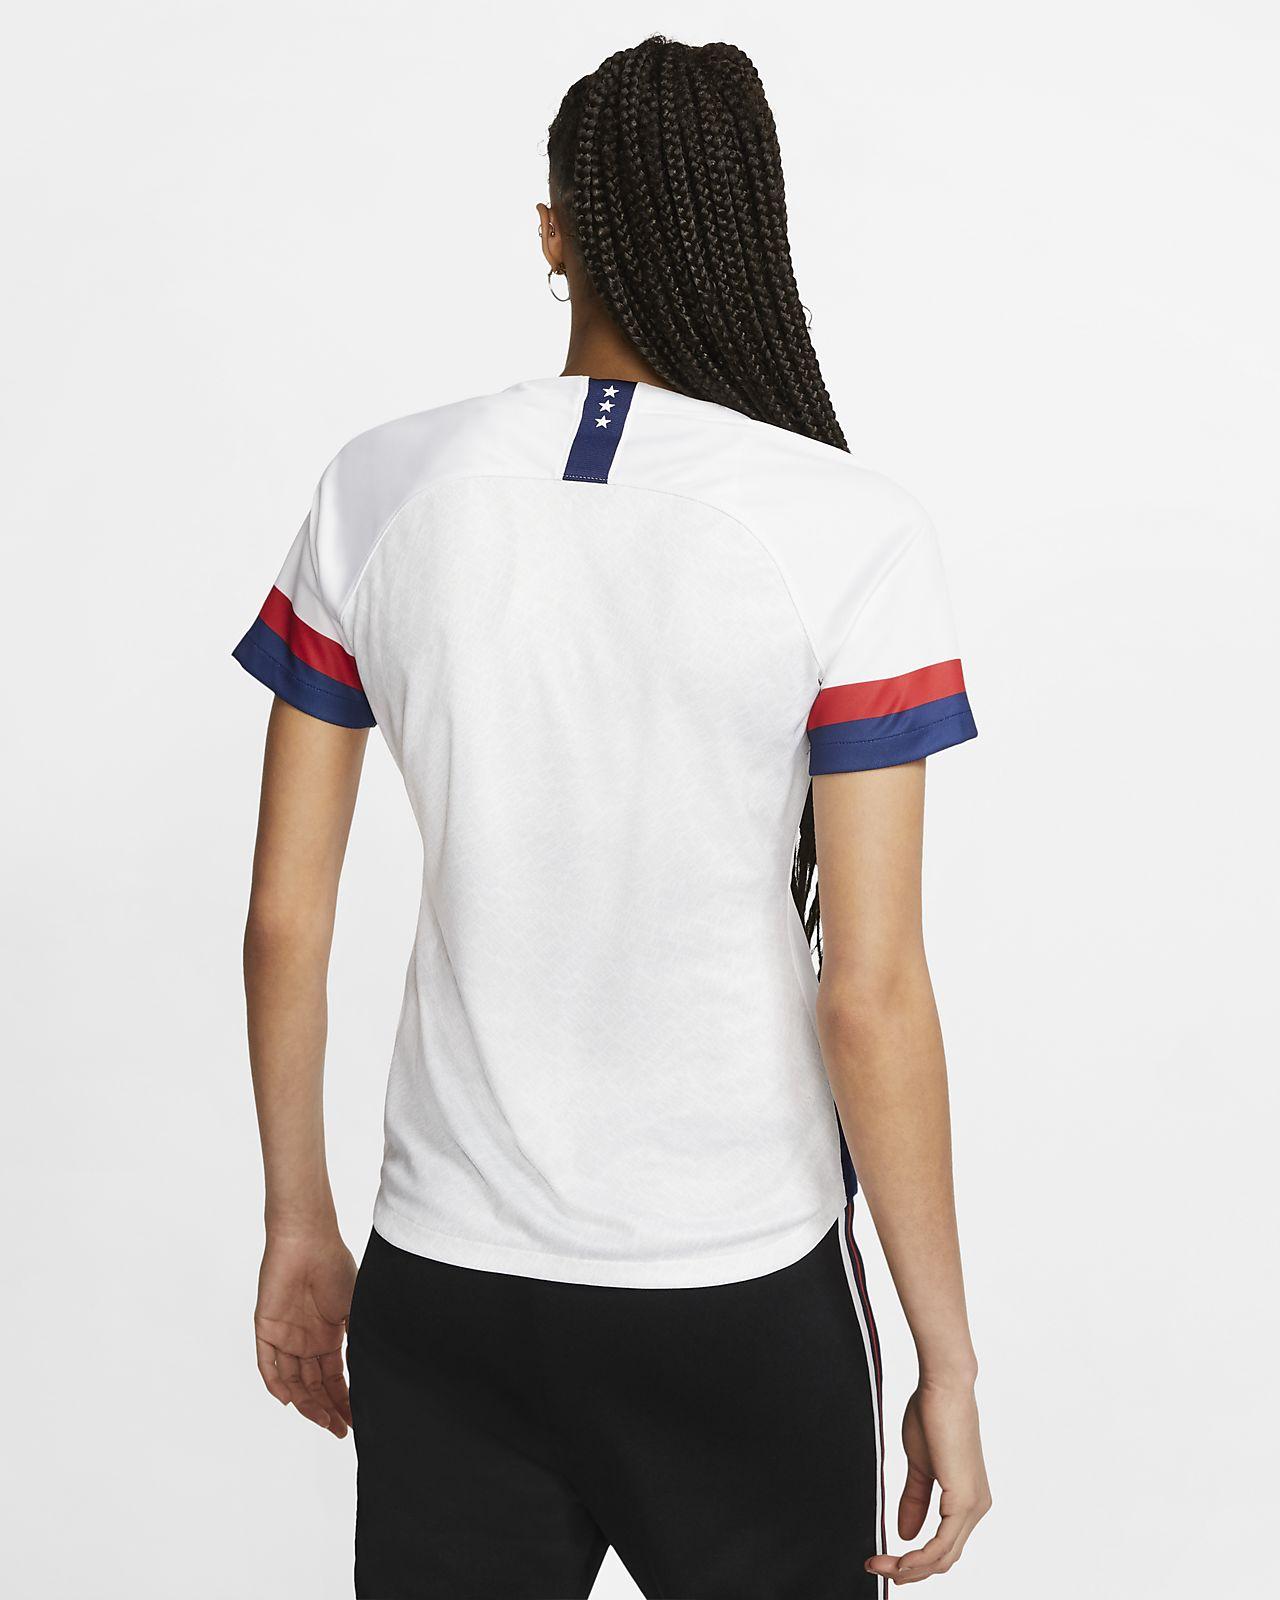 0c8c8d09 US 2019 Stadium Home Women's Football Shirt. Nike.com EG